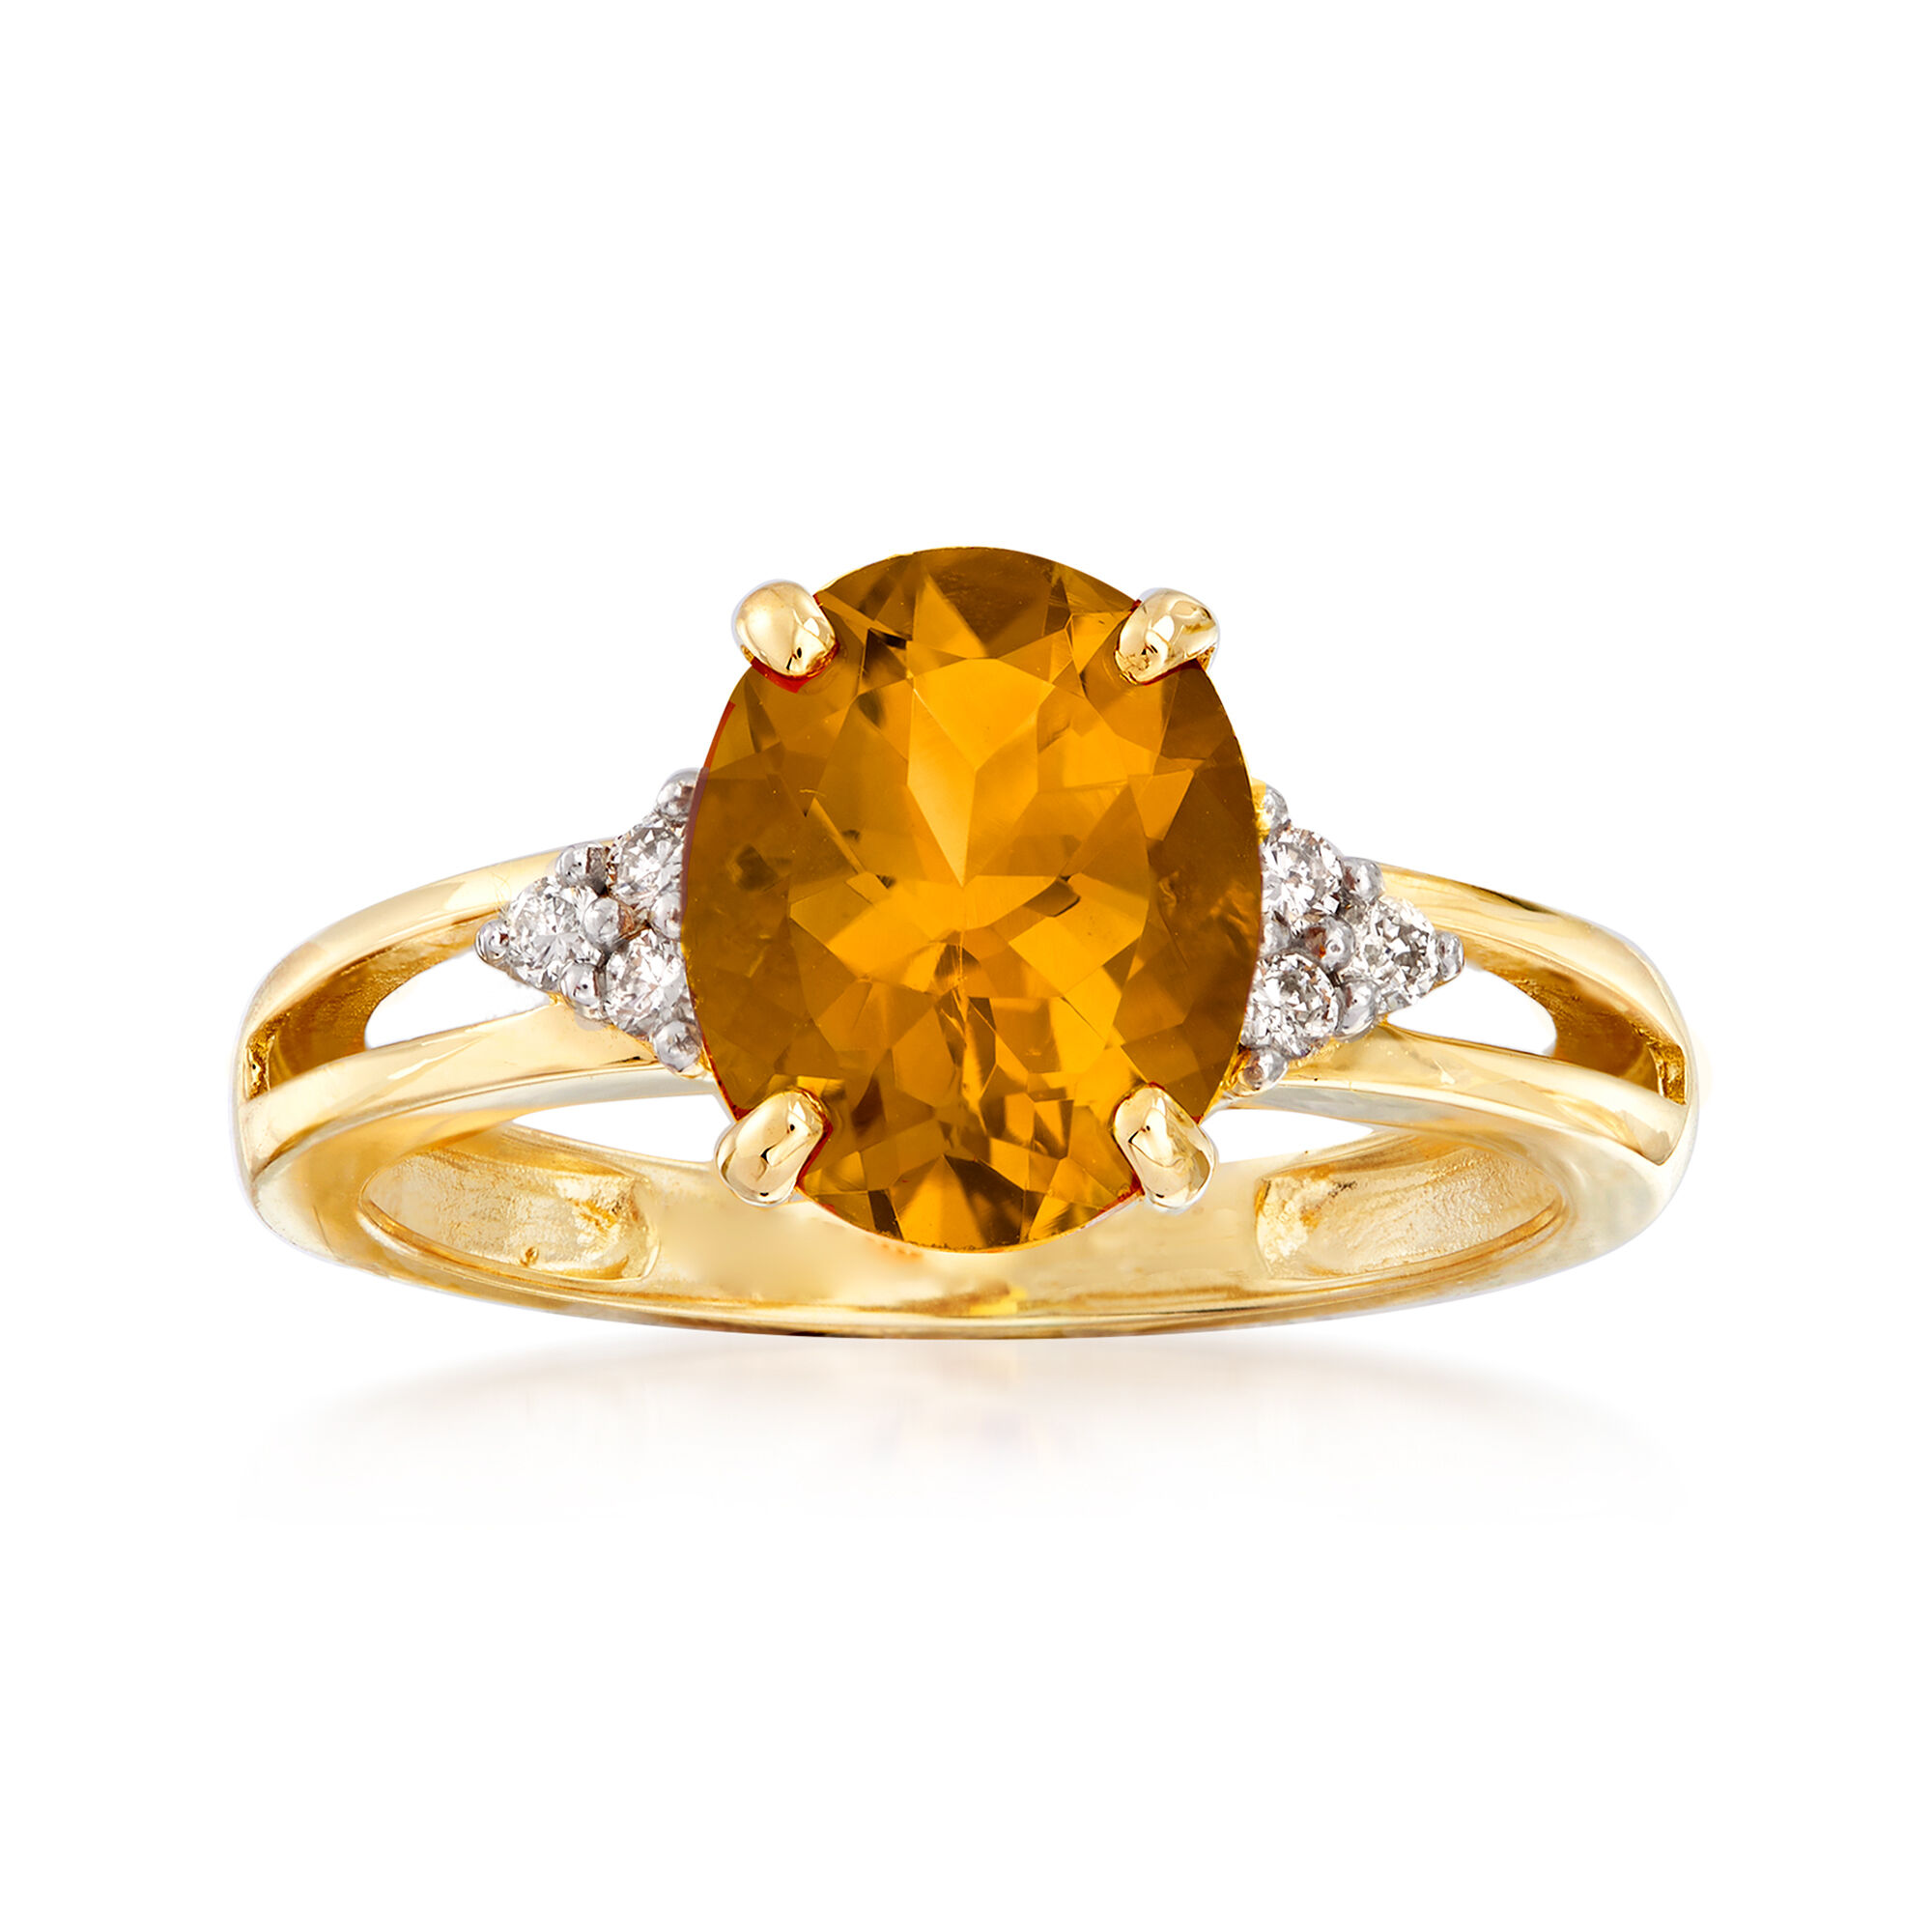 DiamondJewelryNY 14kt Gold Filled St James The Lesser Pendant